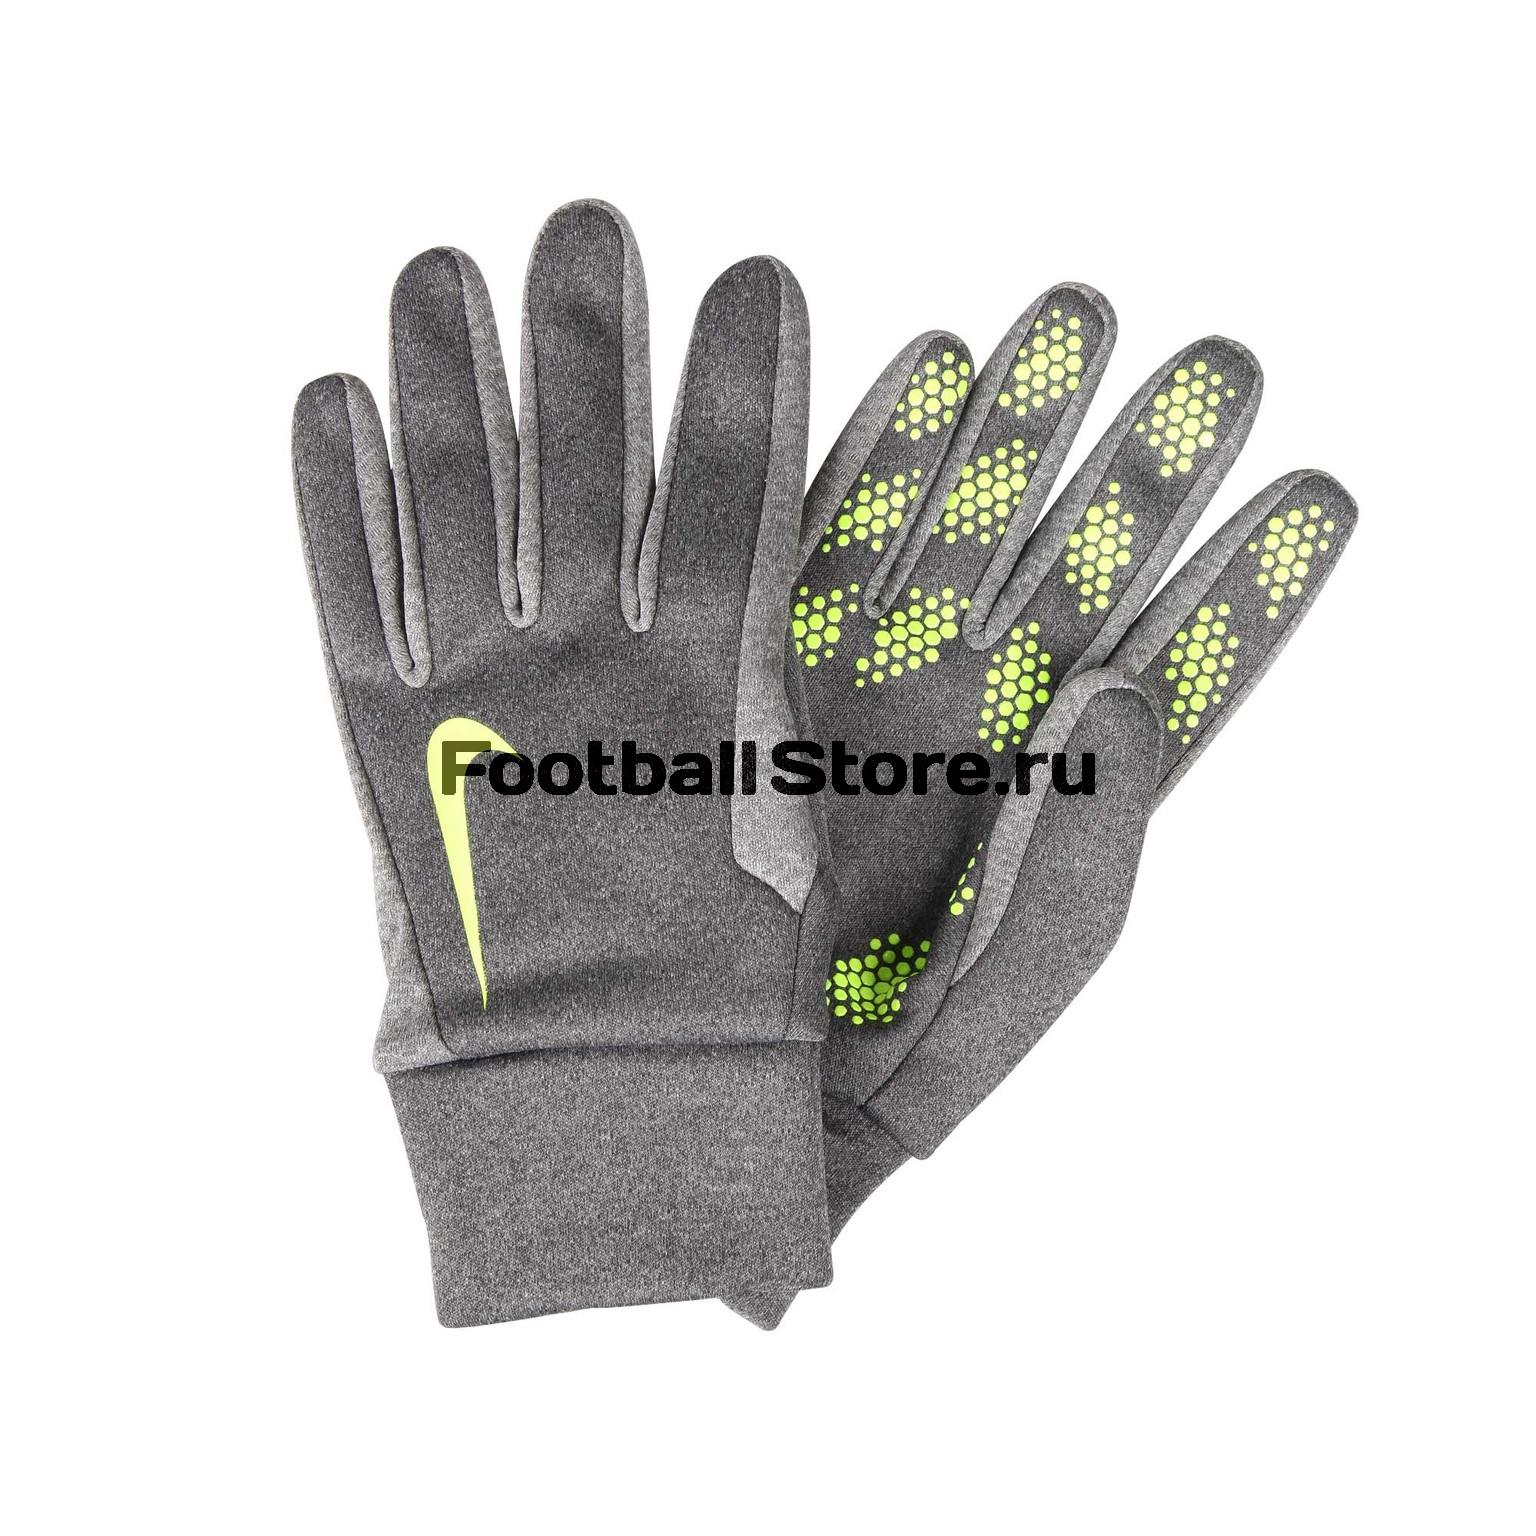 Перчатки Nike Перчатки тренировочные Nike HyperWarm Field Player GS0321-071